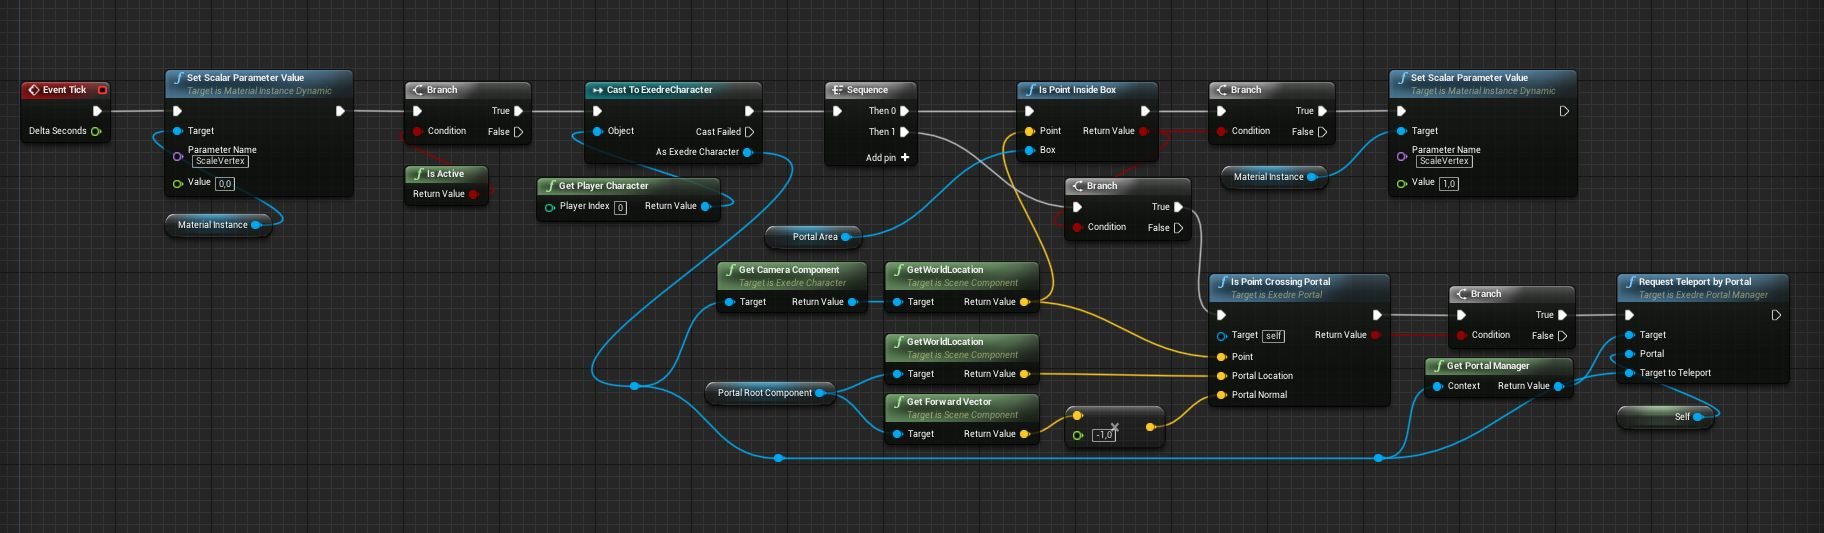 Thinking with Portals: создаём порталы в Unreal Engine 4 - 21